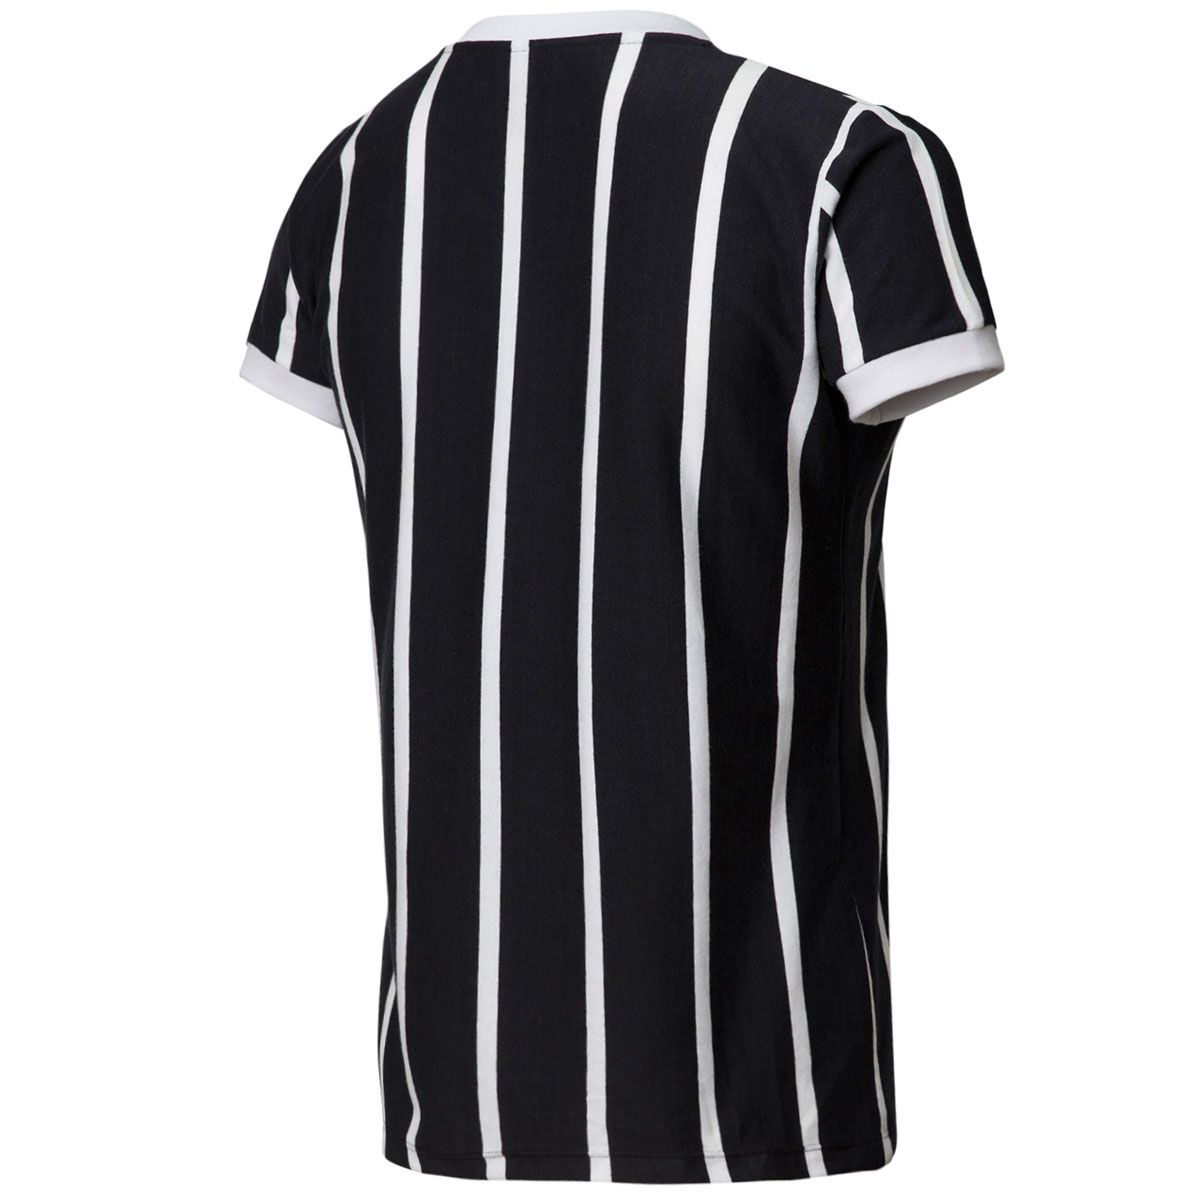 Camisa Feminina Baby Look Retrô Gol Classic Sócrates Ex - Corinthians